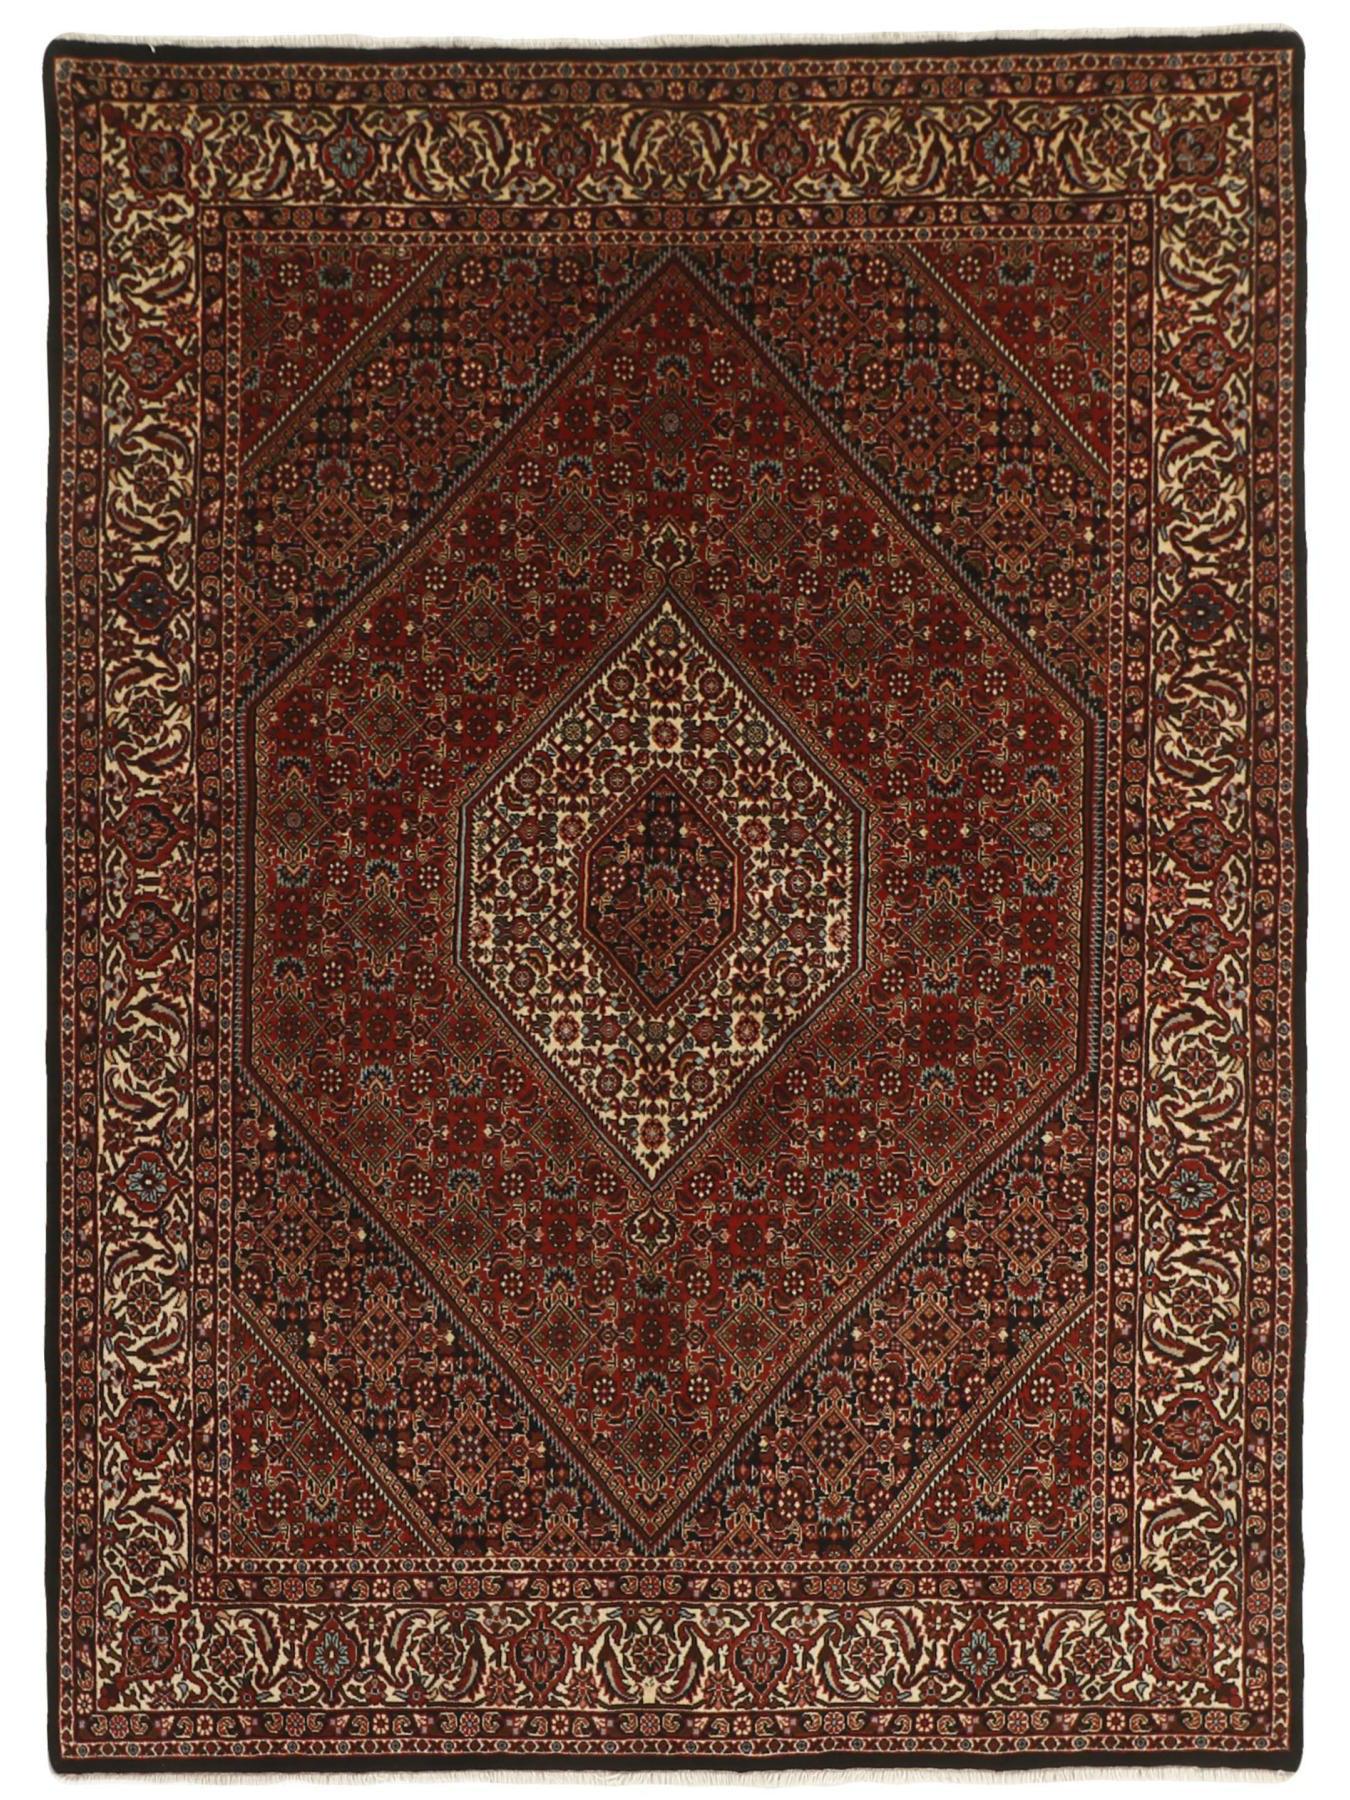 Persian carpets - Bidjar Zandjan